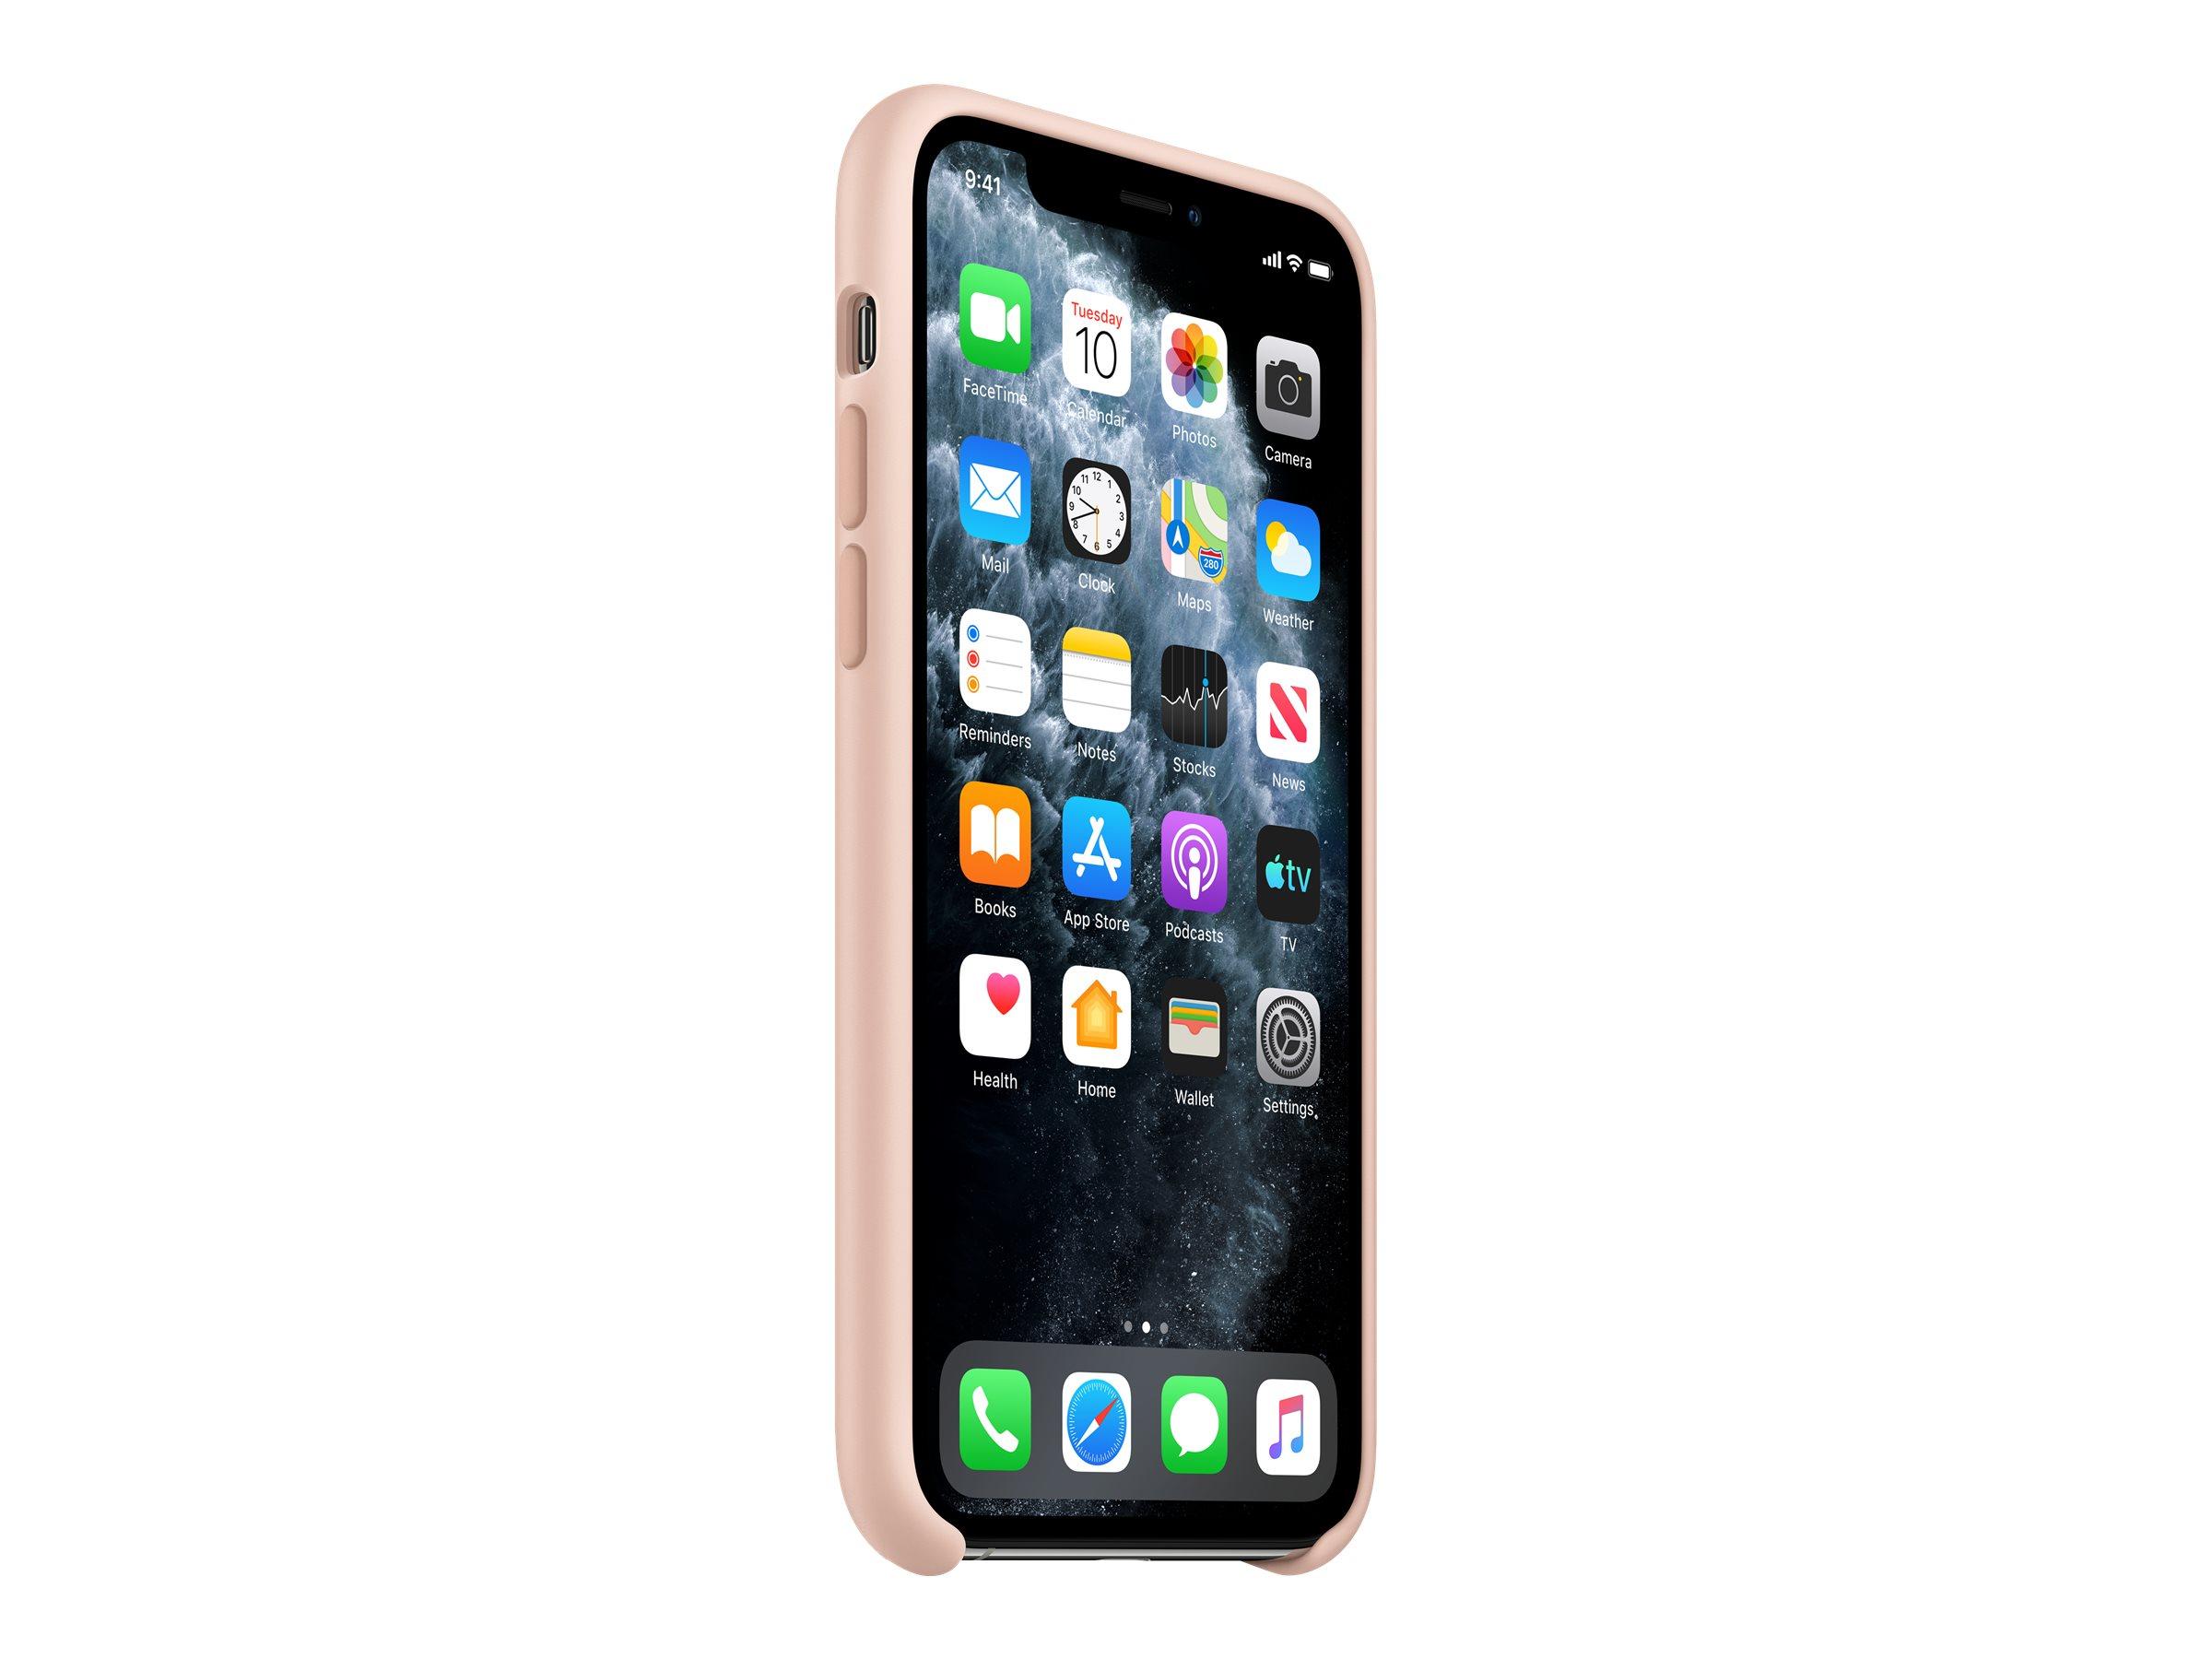 Hintere abdeckung fuer mobiltelefon silikon rosa sandfarben fuer iphone 11 pro 11867120 mwym2zm a